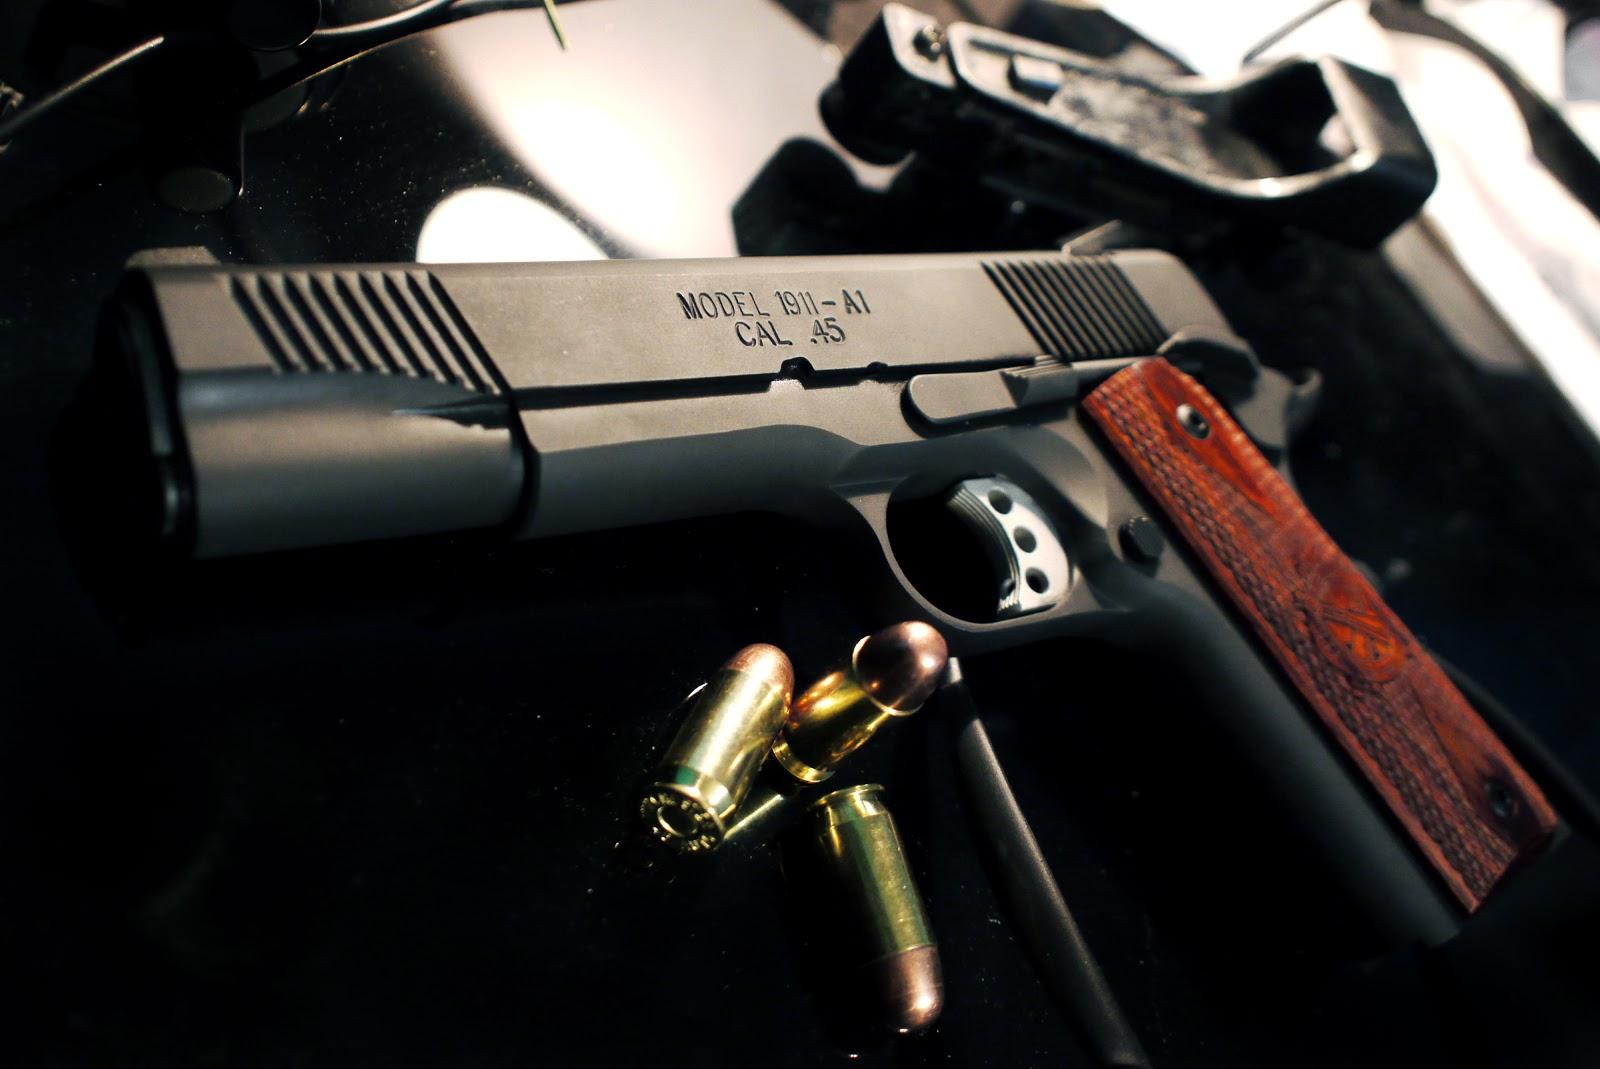 guns weapons m1911 45acp desktop 4000x2672 hd wallpaper 628897jpeg 1600x1069